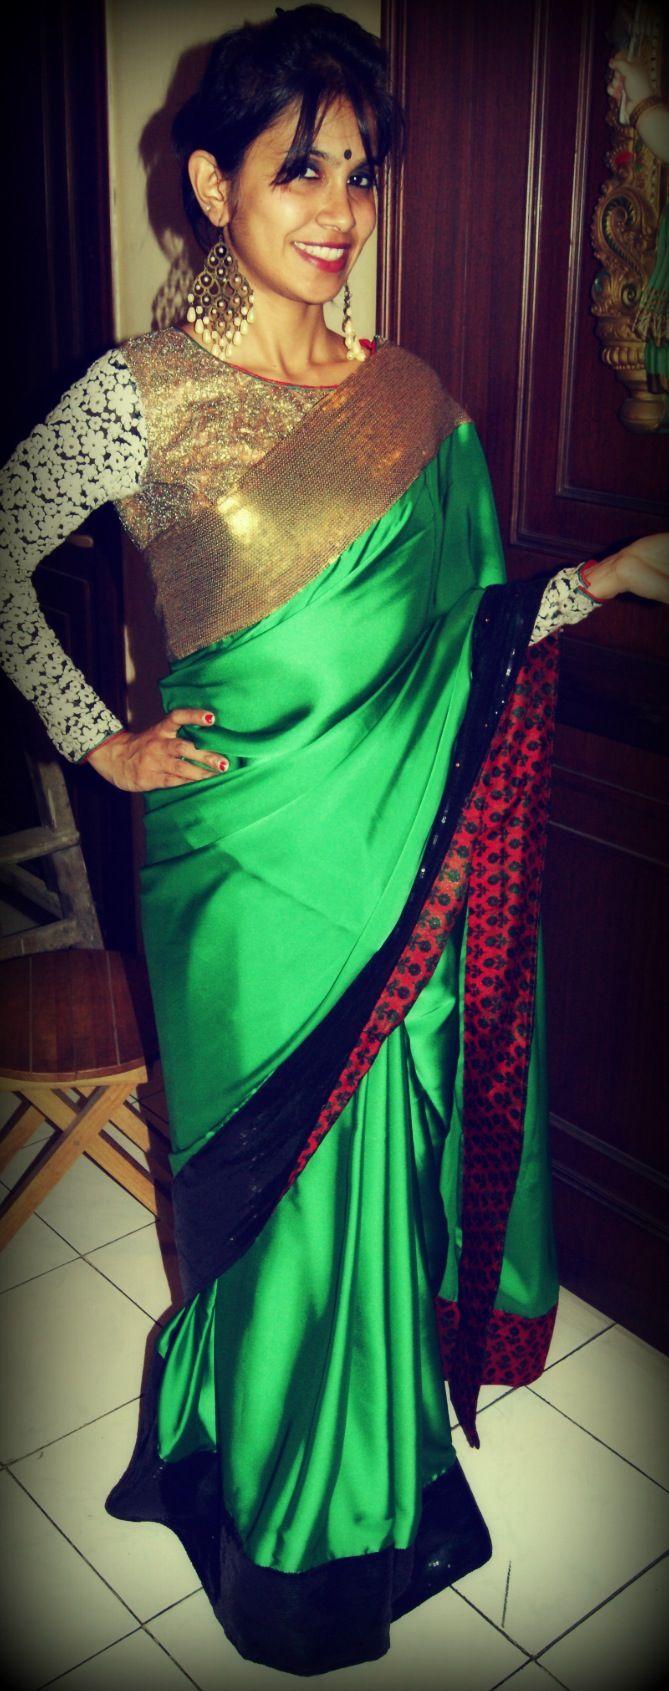 Sari by Ayush Kejriwal , for purchase enquires email at ayushk@hotmail.co.uk or find my Facebook page - Ayush Kejriwal